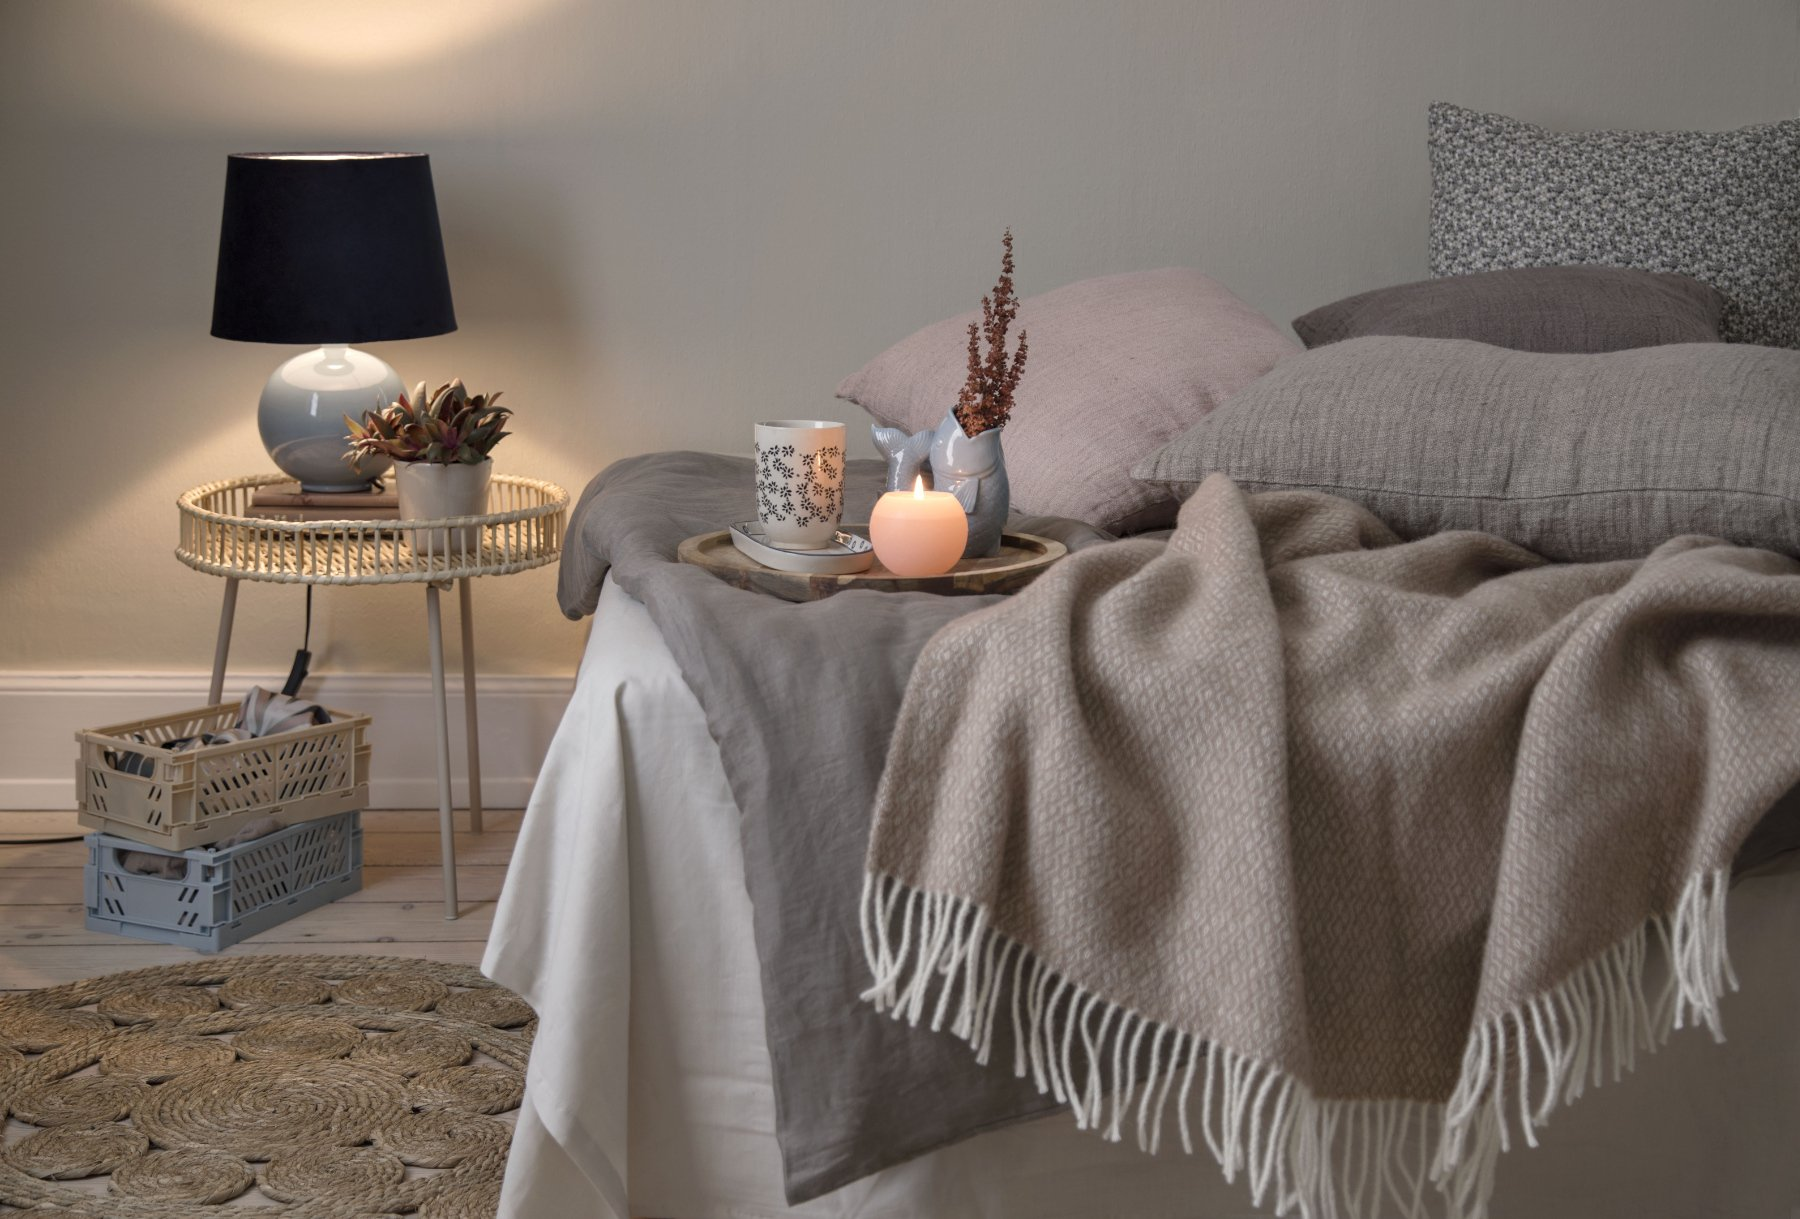 SostreneGrene hygge moment bedroom cozy